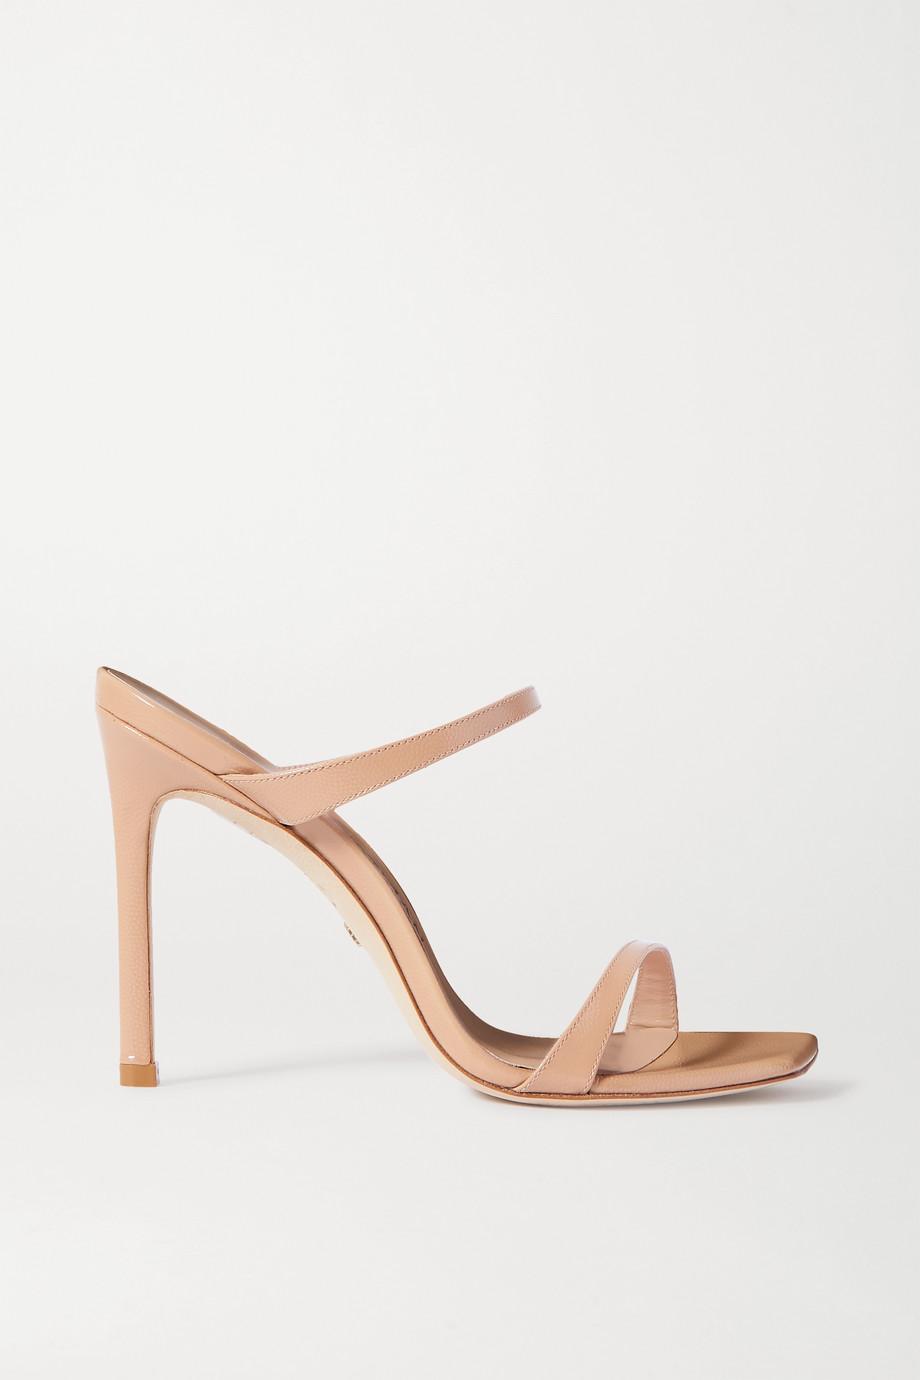 Stuart Weitzman Aleena textured patent-leather sandals